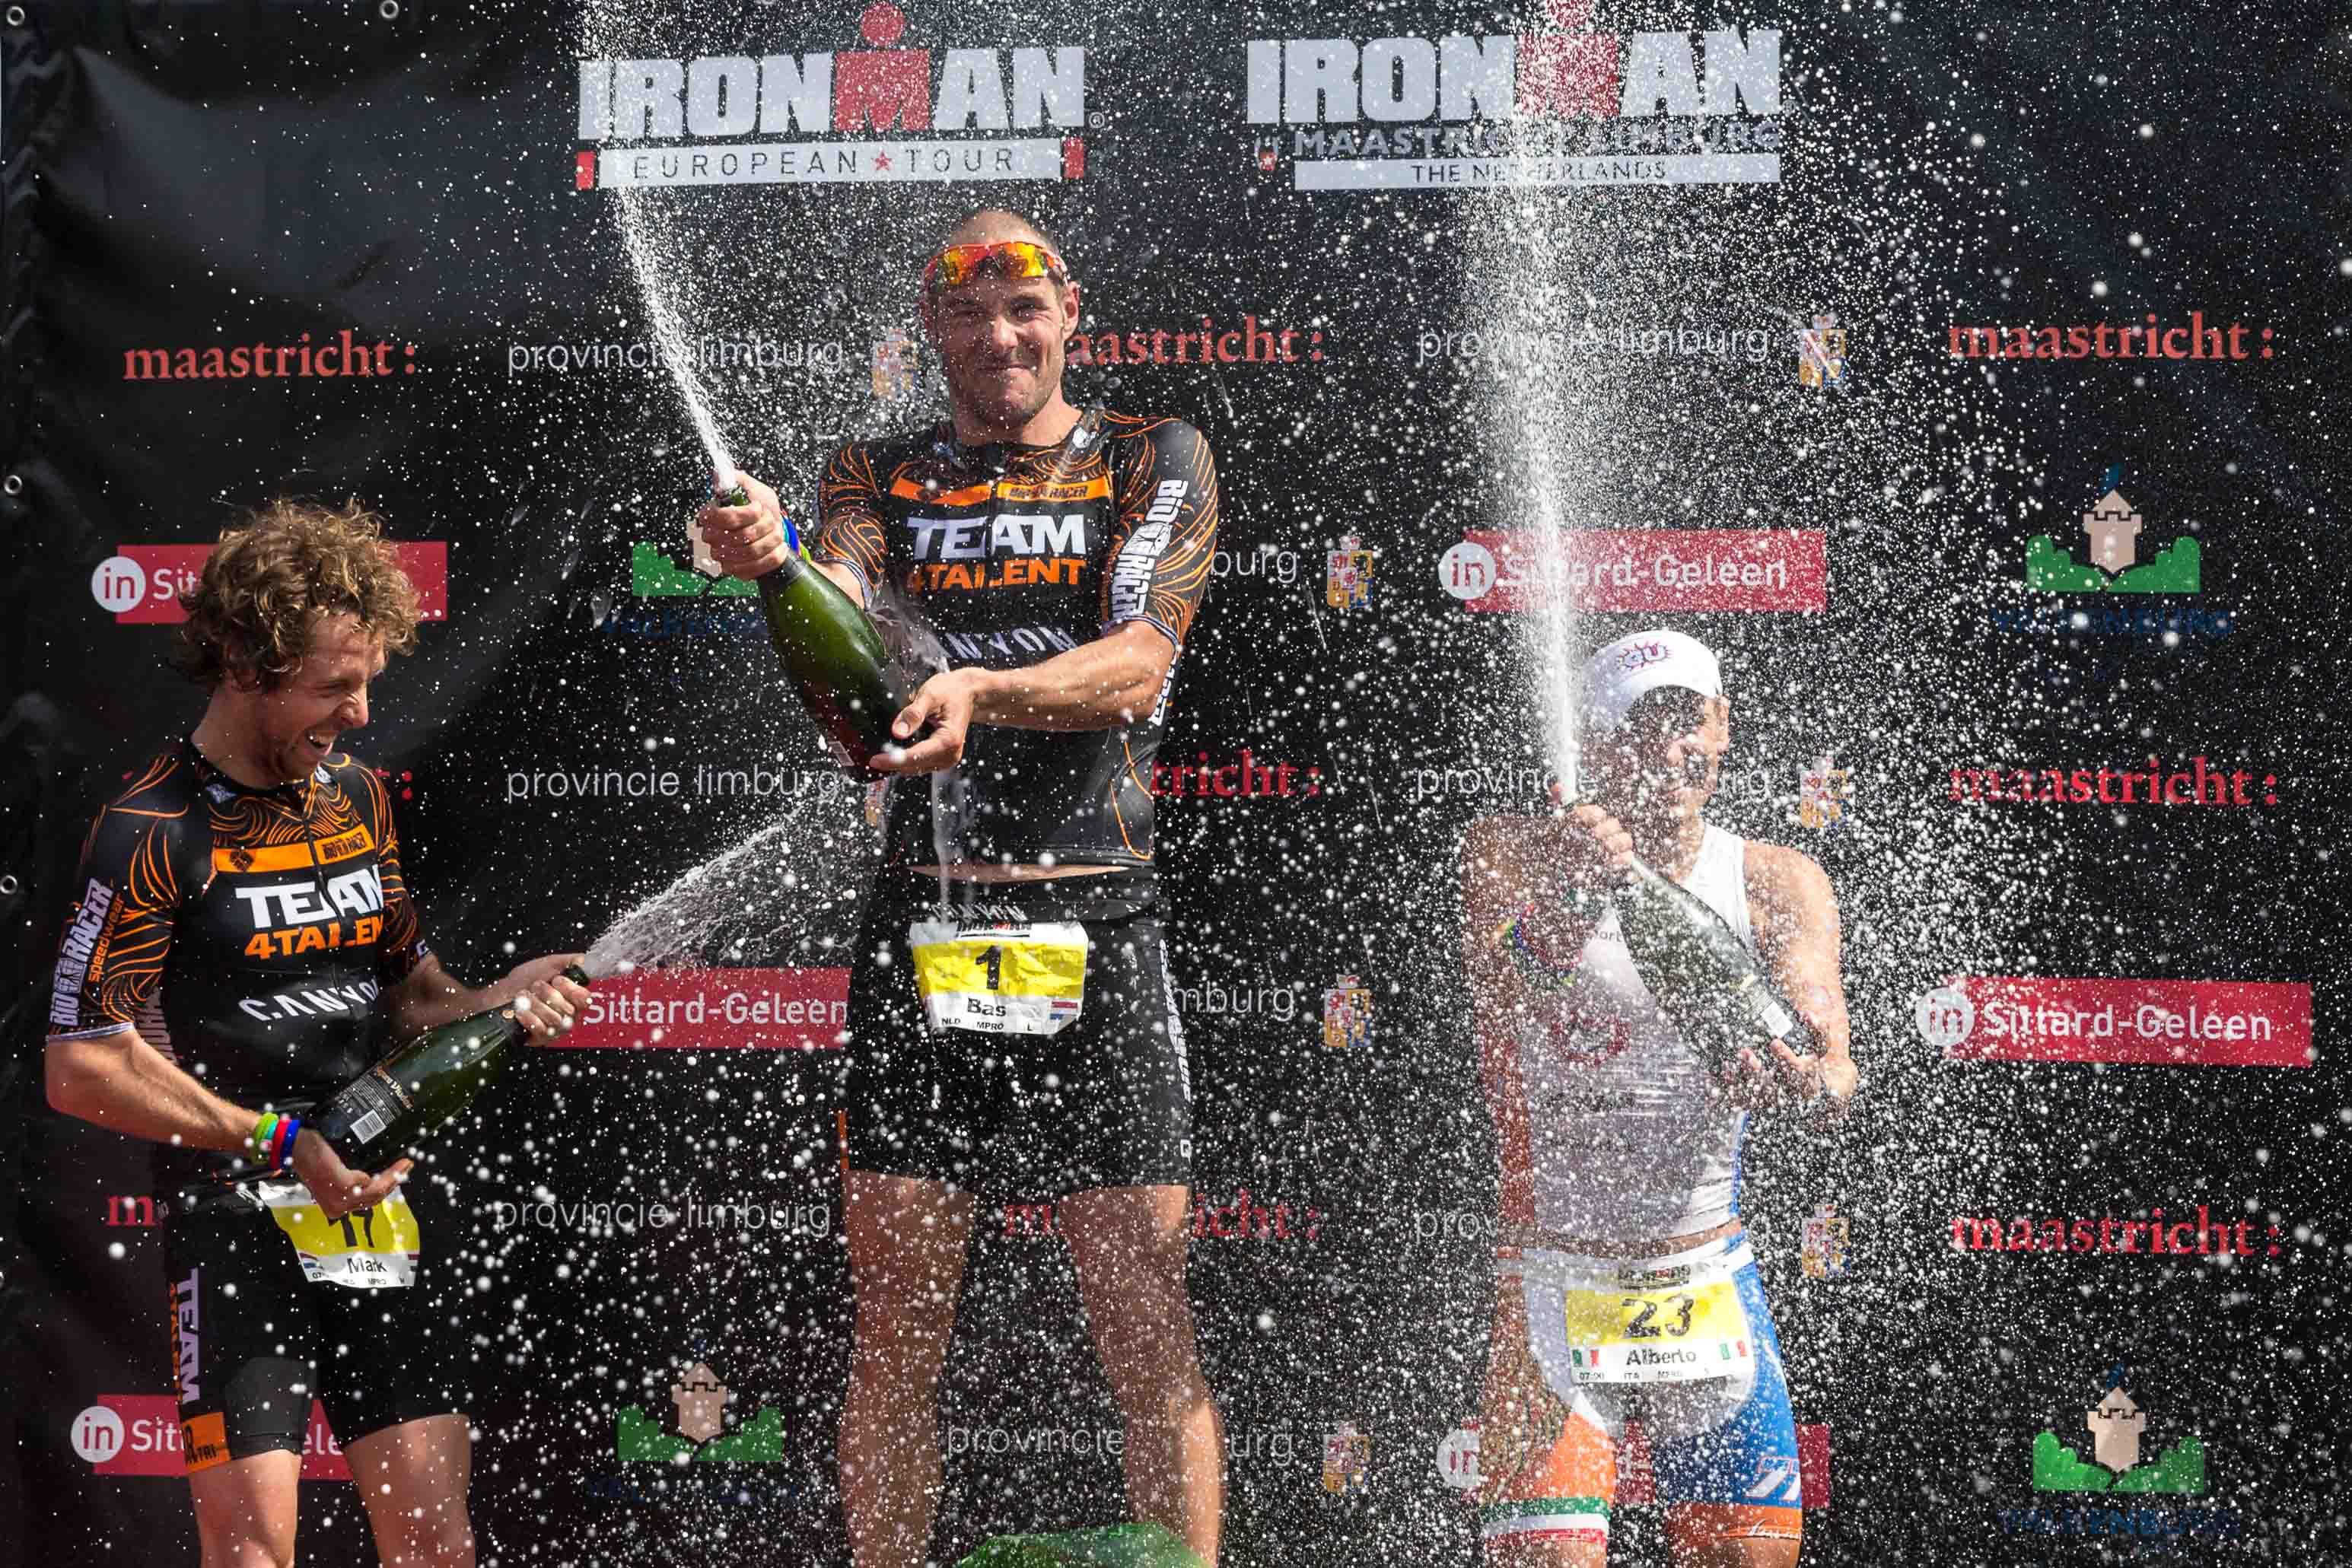 Ironman Maastricht 2015 podium flower ceremony